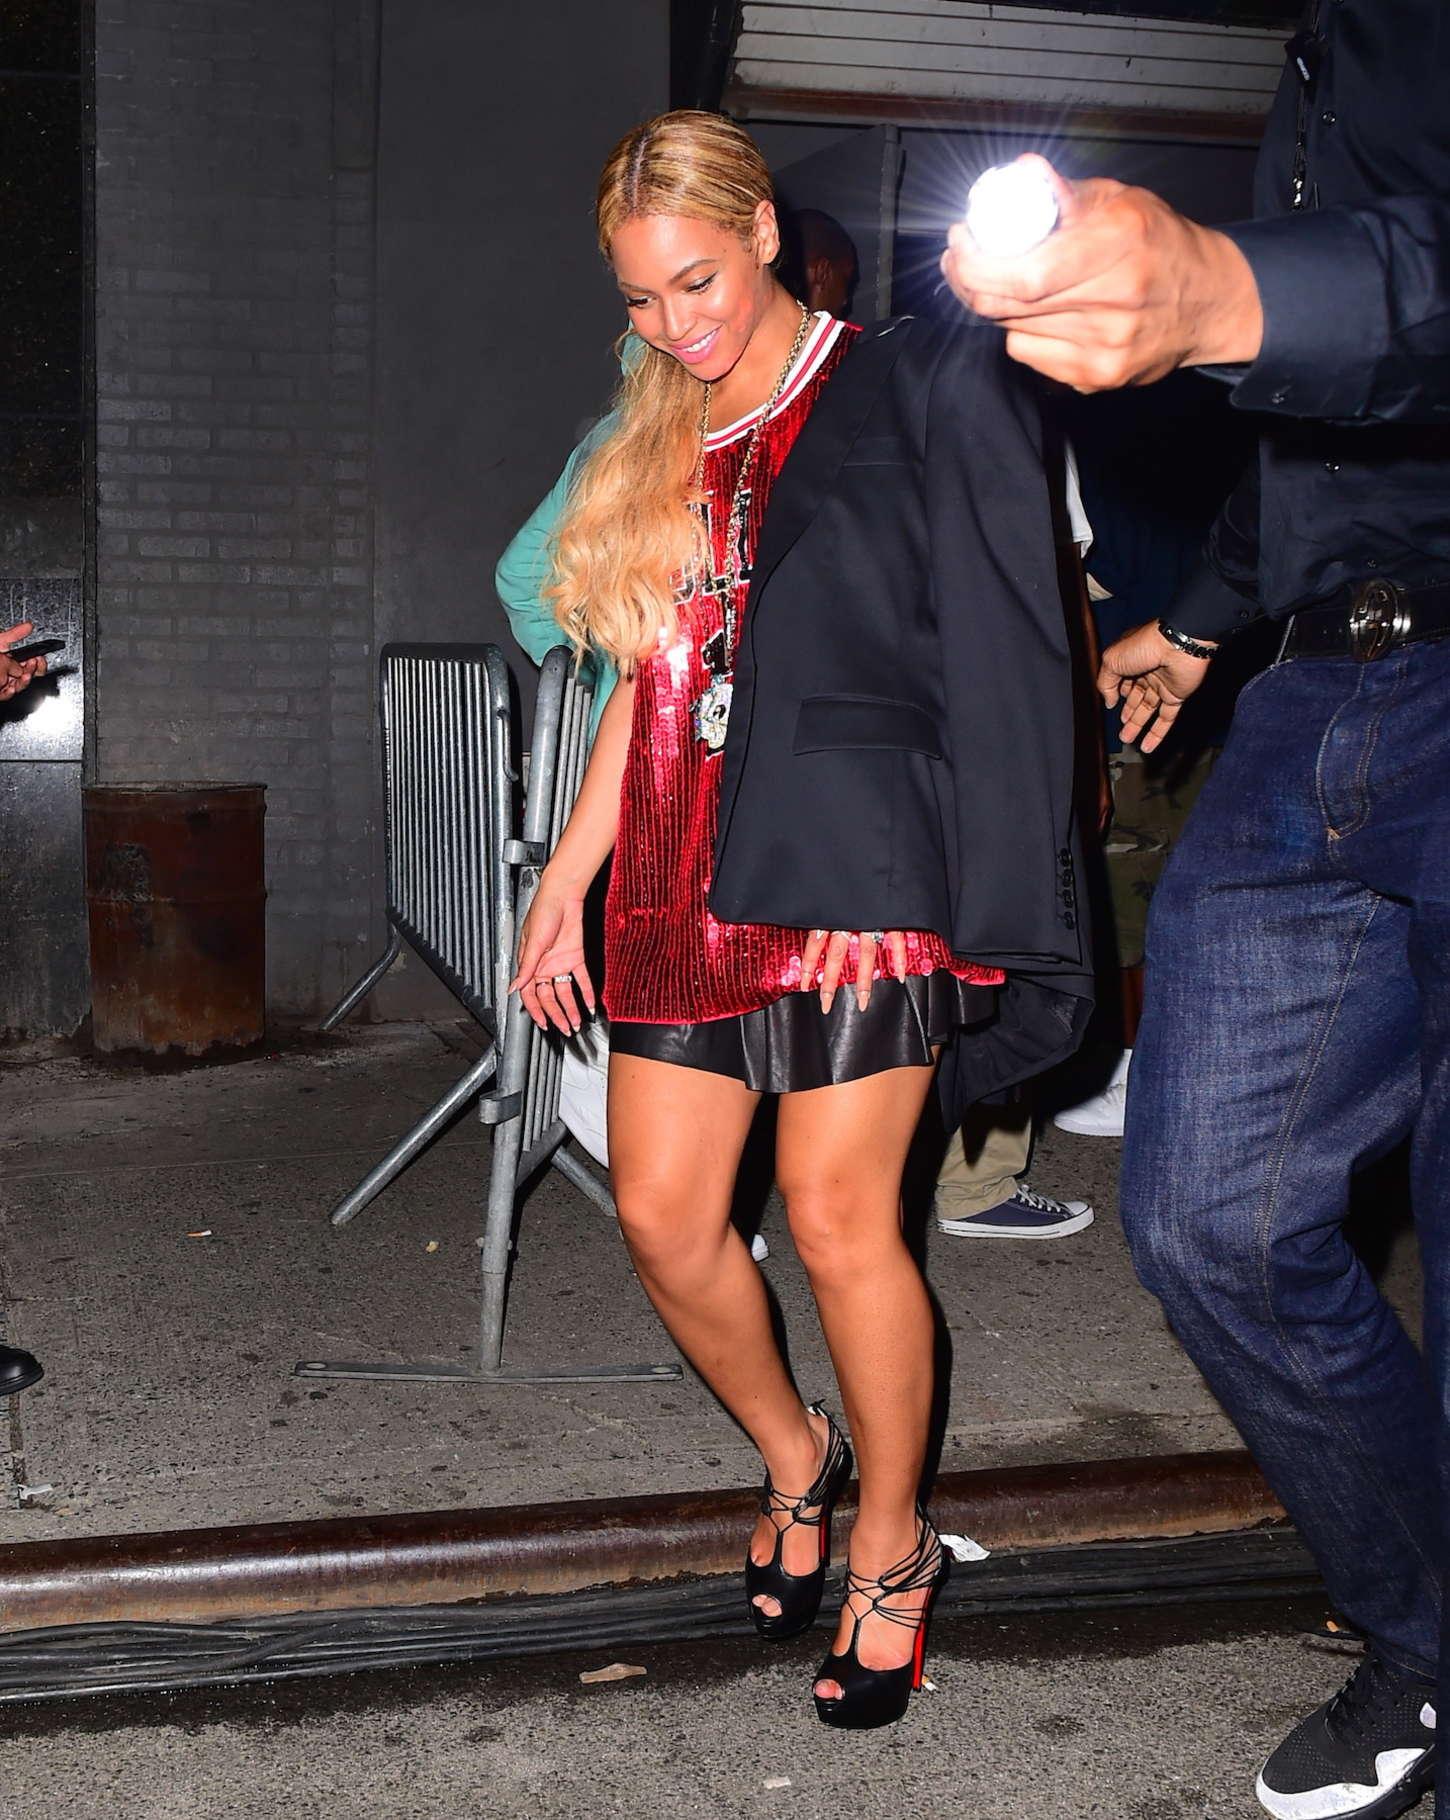 Beyonce leaving Terminal 5 in NYC